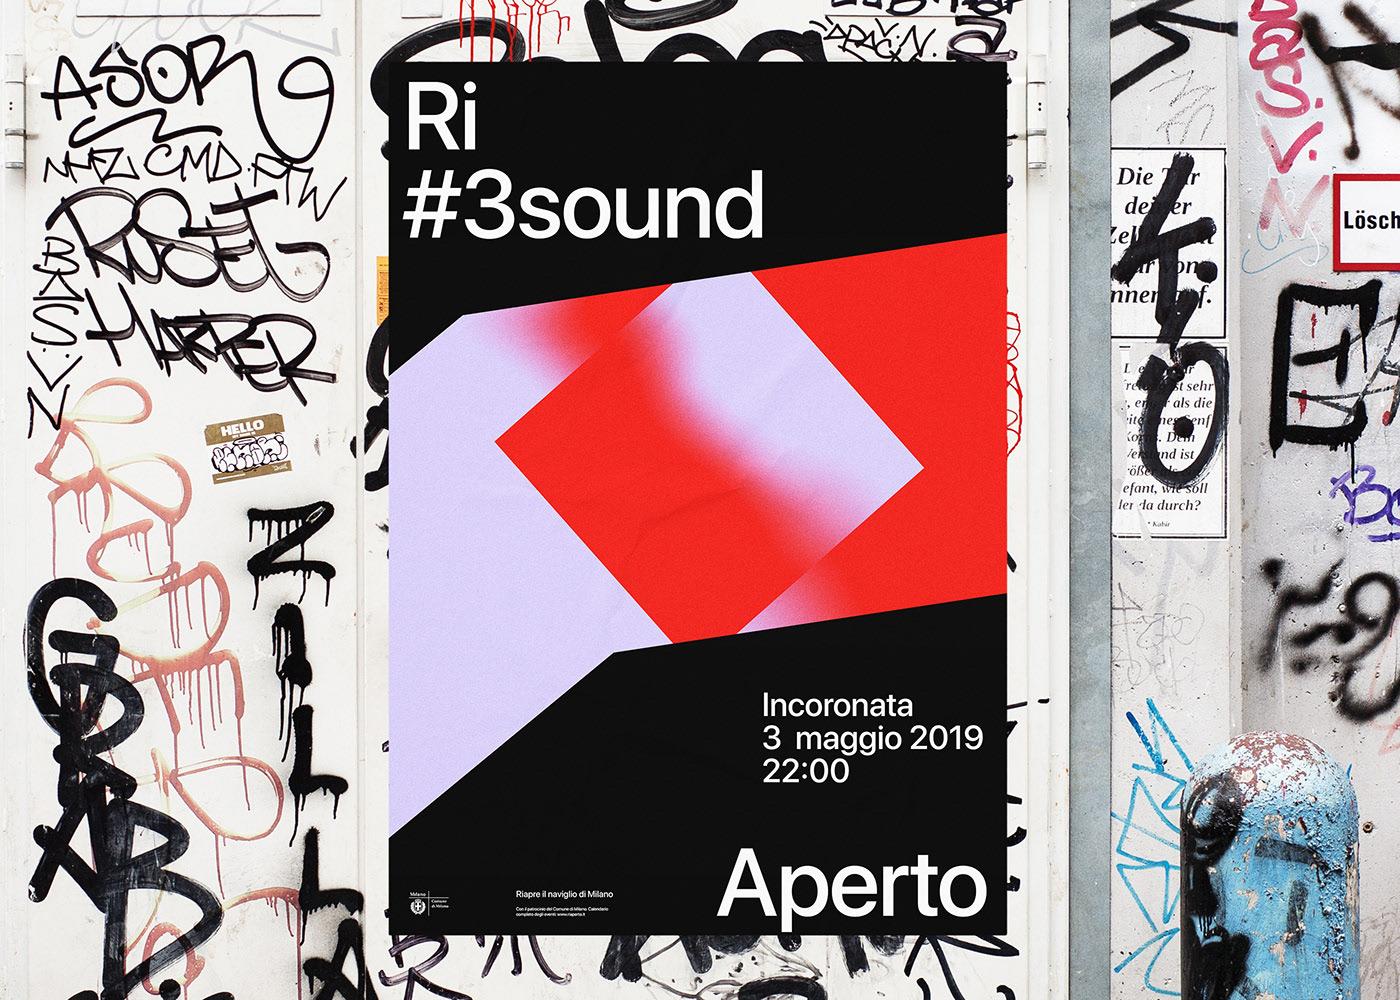 RiAperto festival branding by Andrea Bianchi.